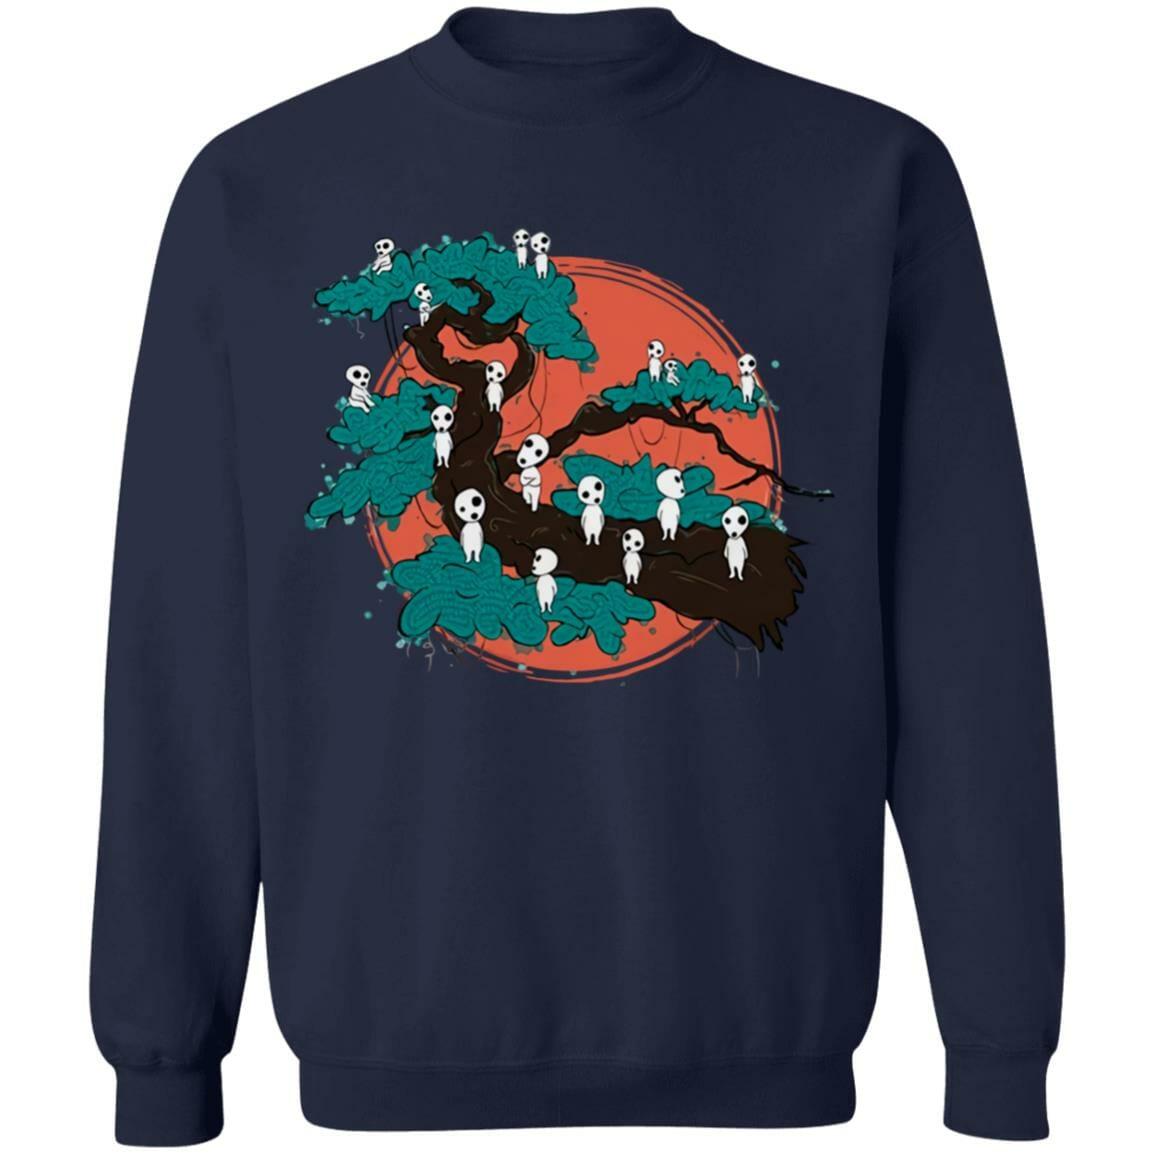 Tree Spirits by the Red Moon Sweatshirt